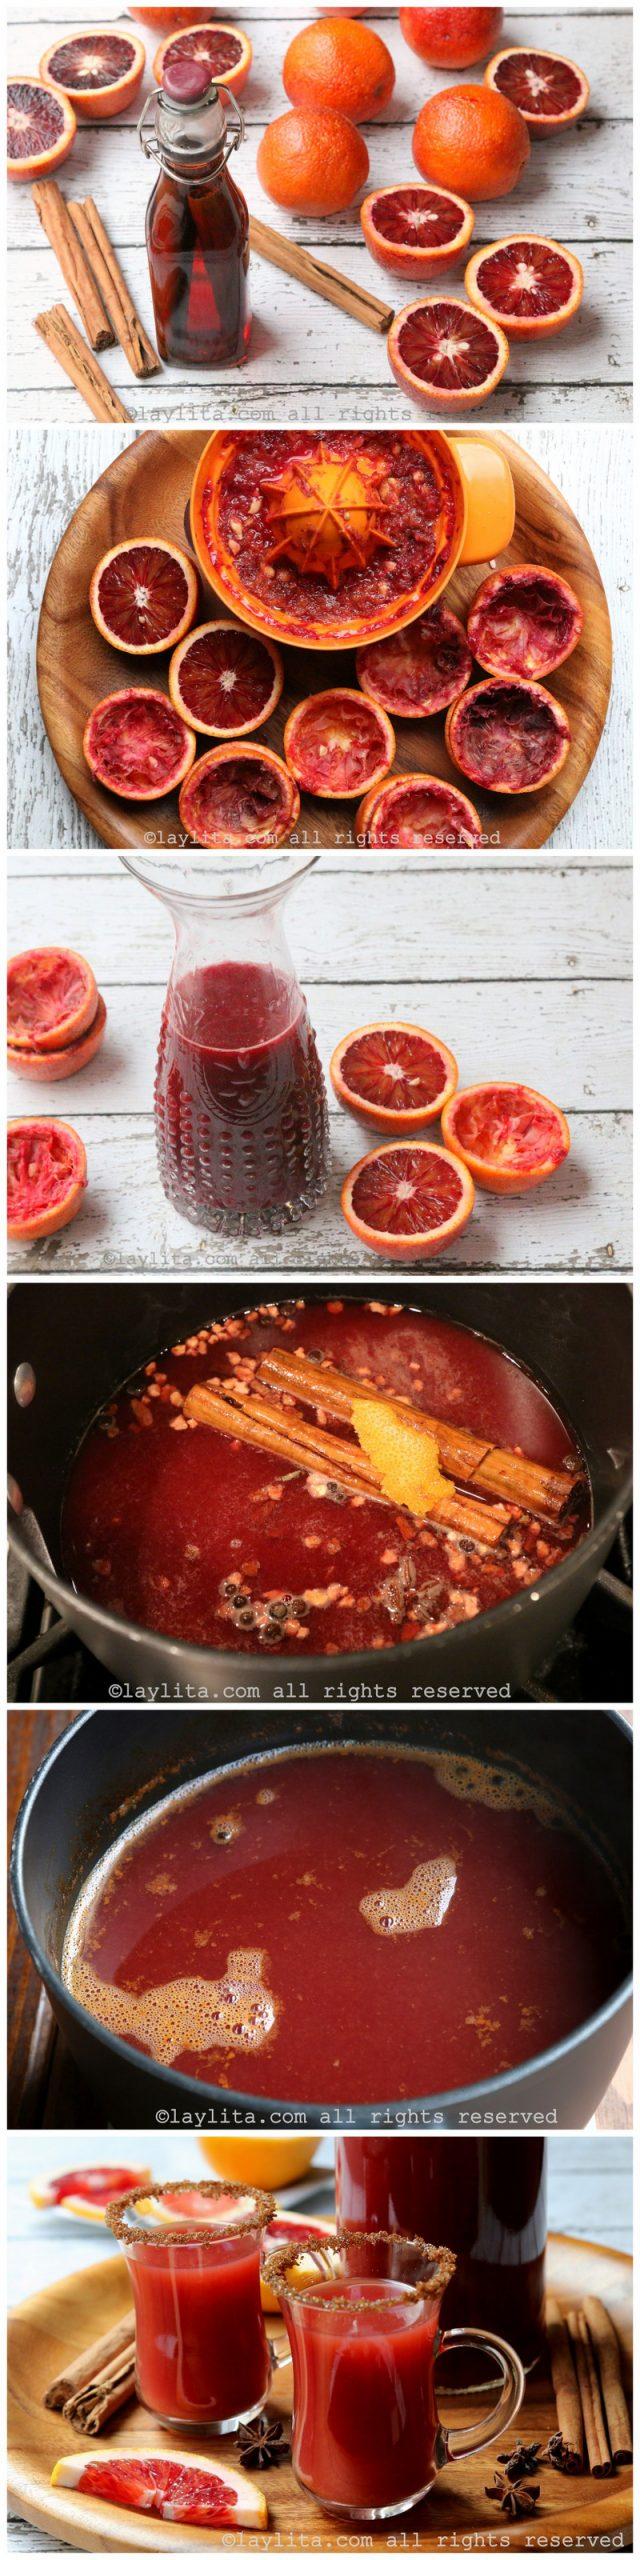 Como hacer canelazo ecuatoriano con naranja roja